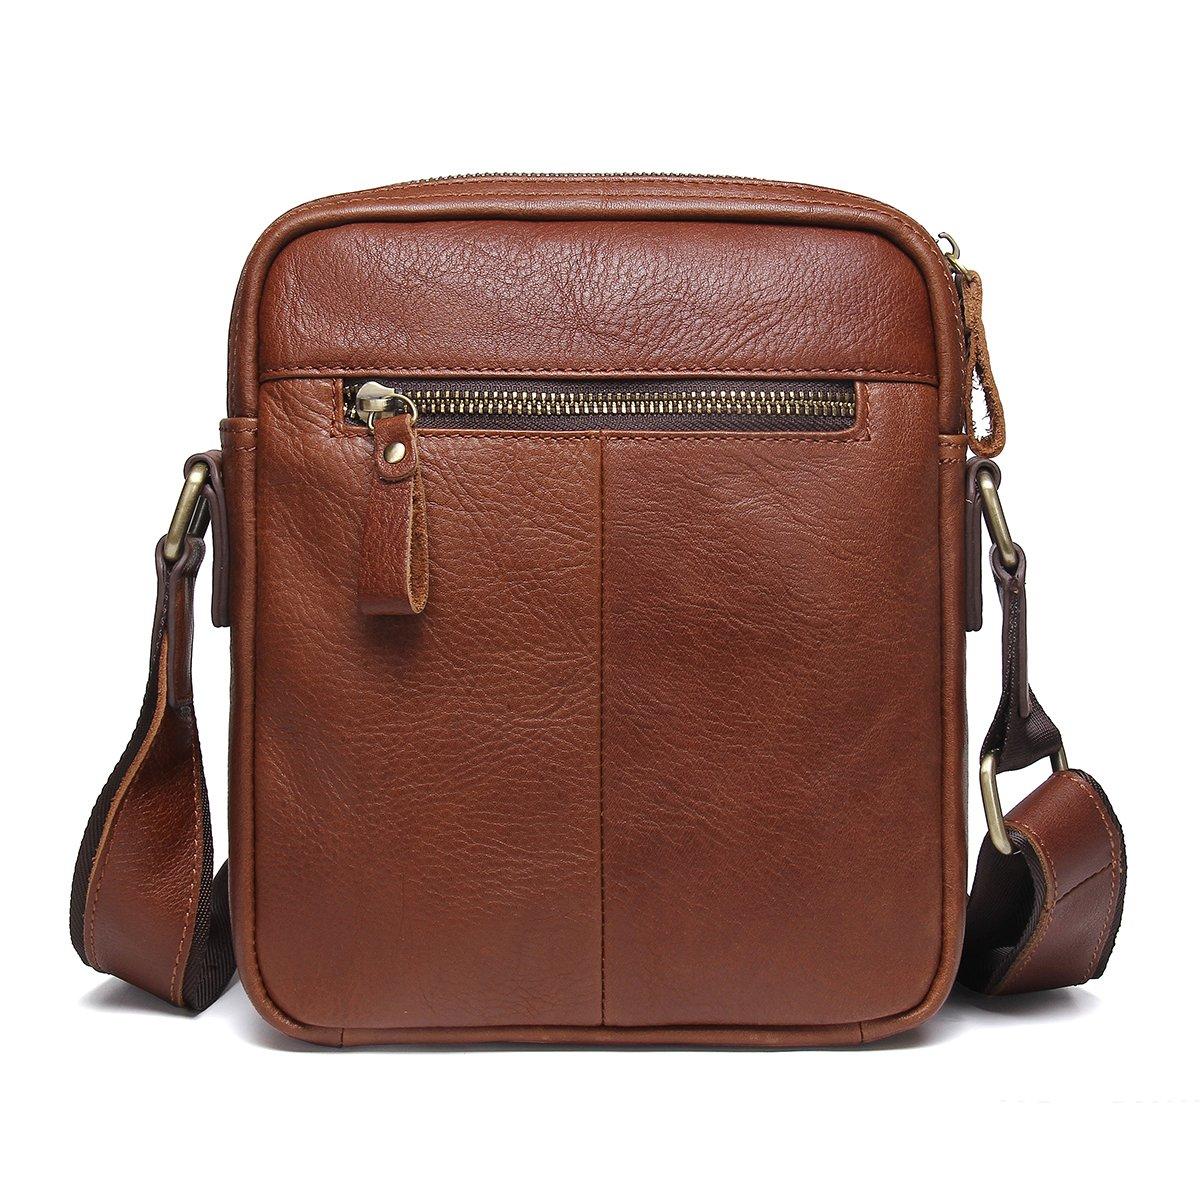 Amazon.com  Contacts Genuine Leather Mens iPad Messenger CrossBody Bag Tab  Handbag Brown  Sports   Outdoors ff9db77e0e